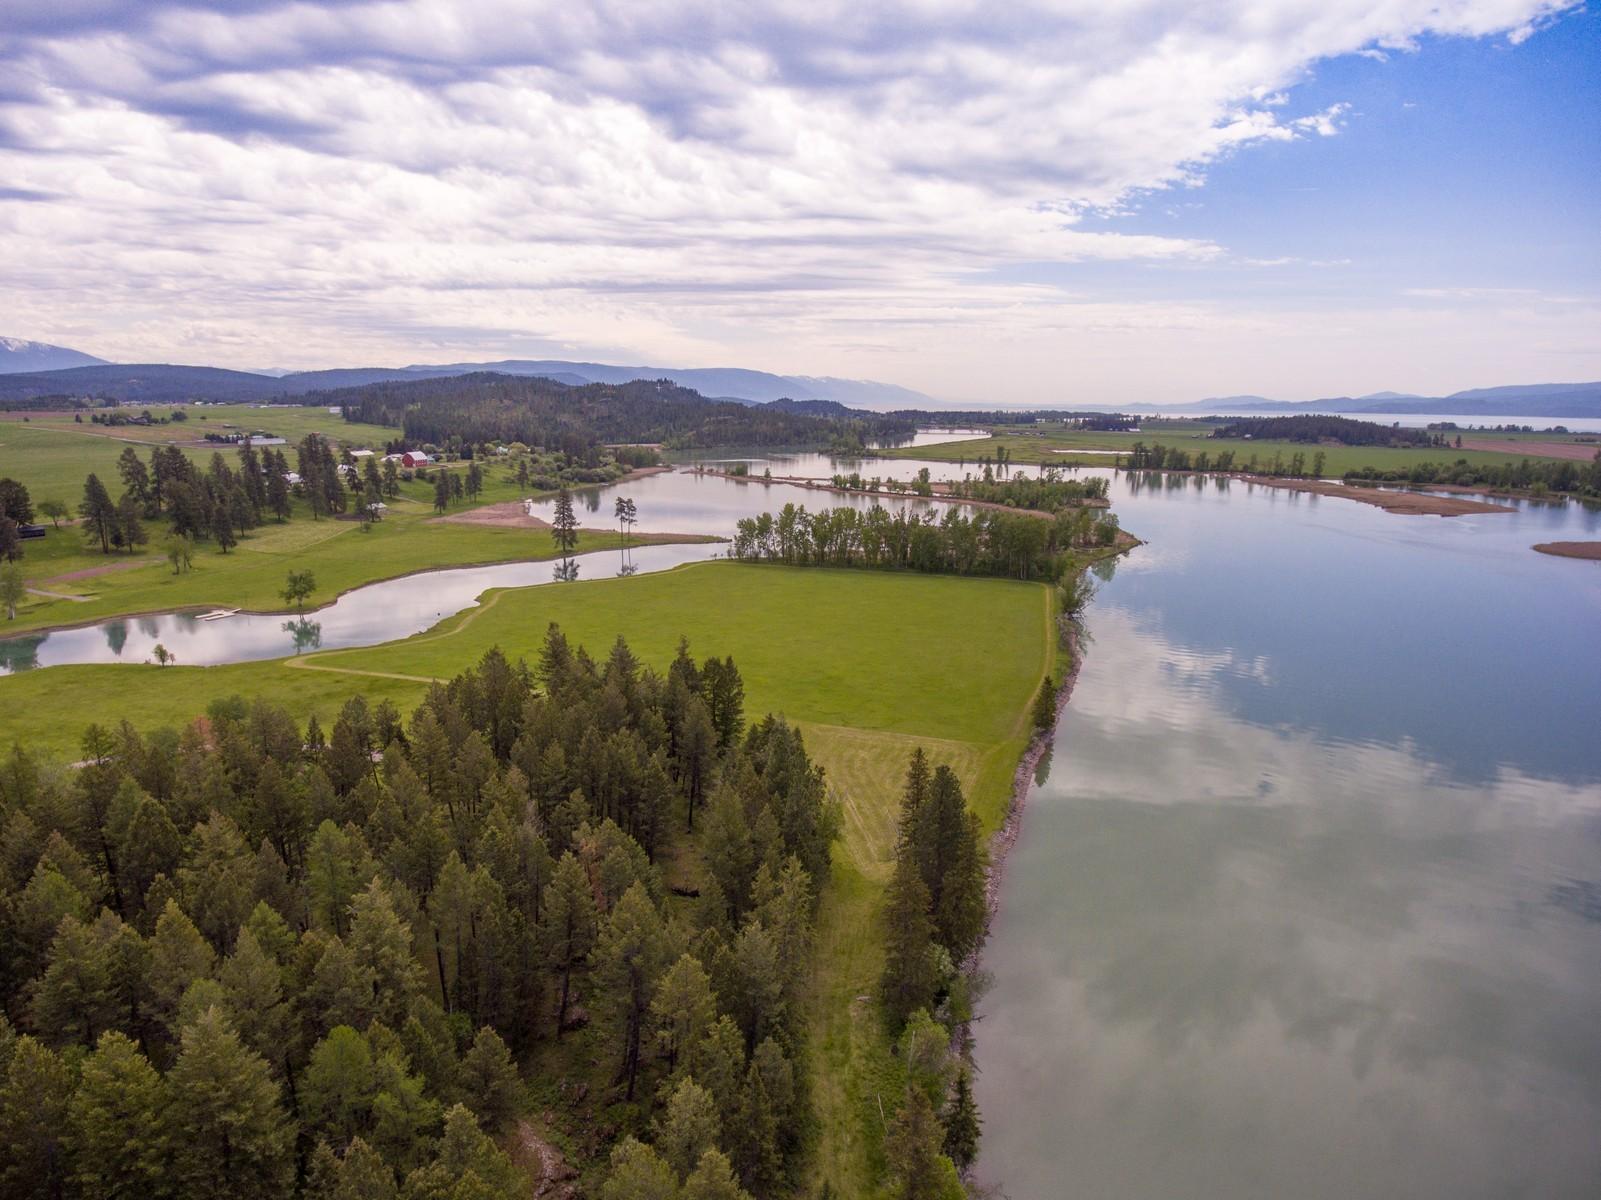 Land for Sale at 700 Ramsfield Rd , Bigfork, MT 59911 700 Ramsfield Rd Bigfork, Montana 59911 United States